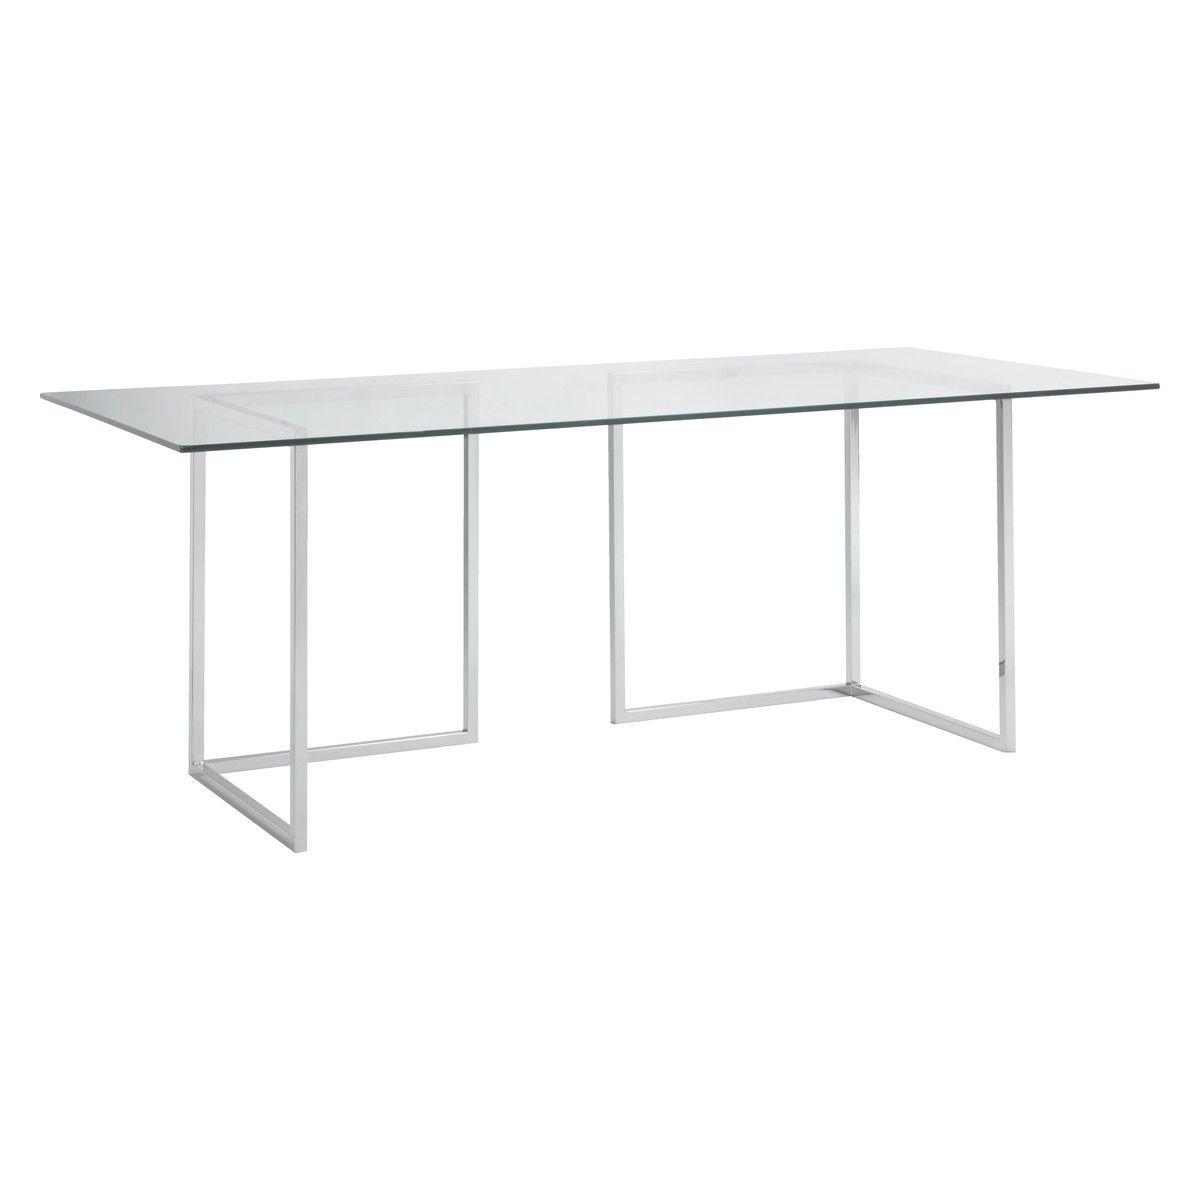 Habitat Metal Desks Desks And Chrome # Habitat Meuble Tv